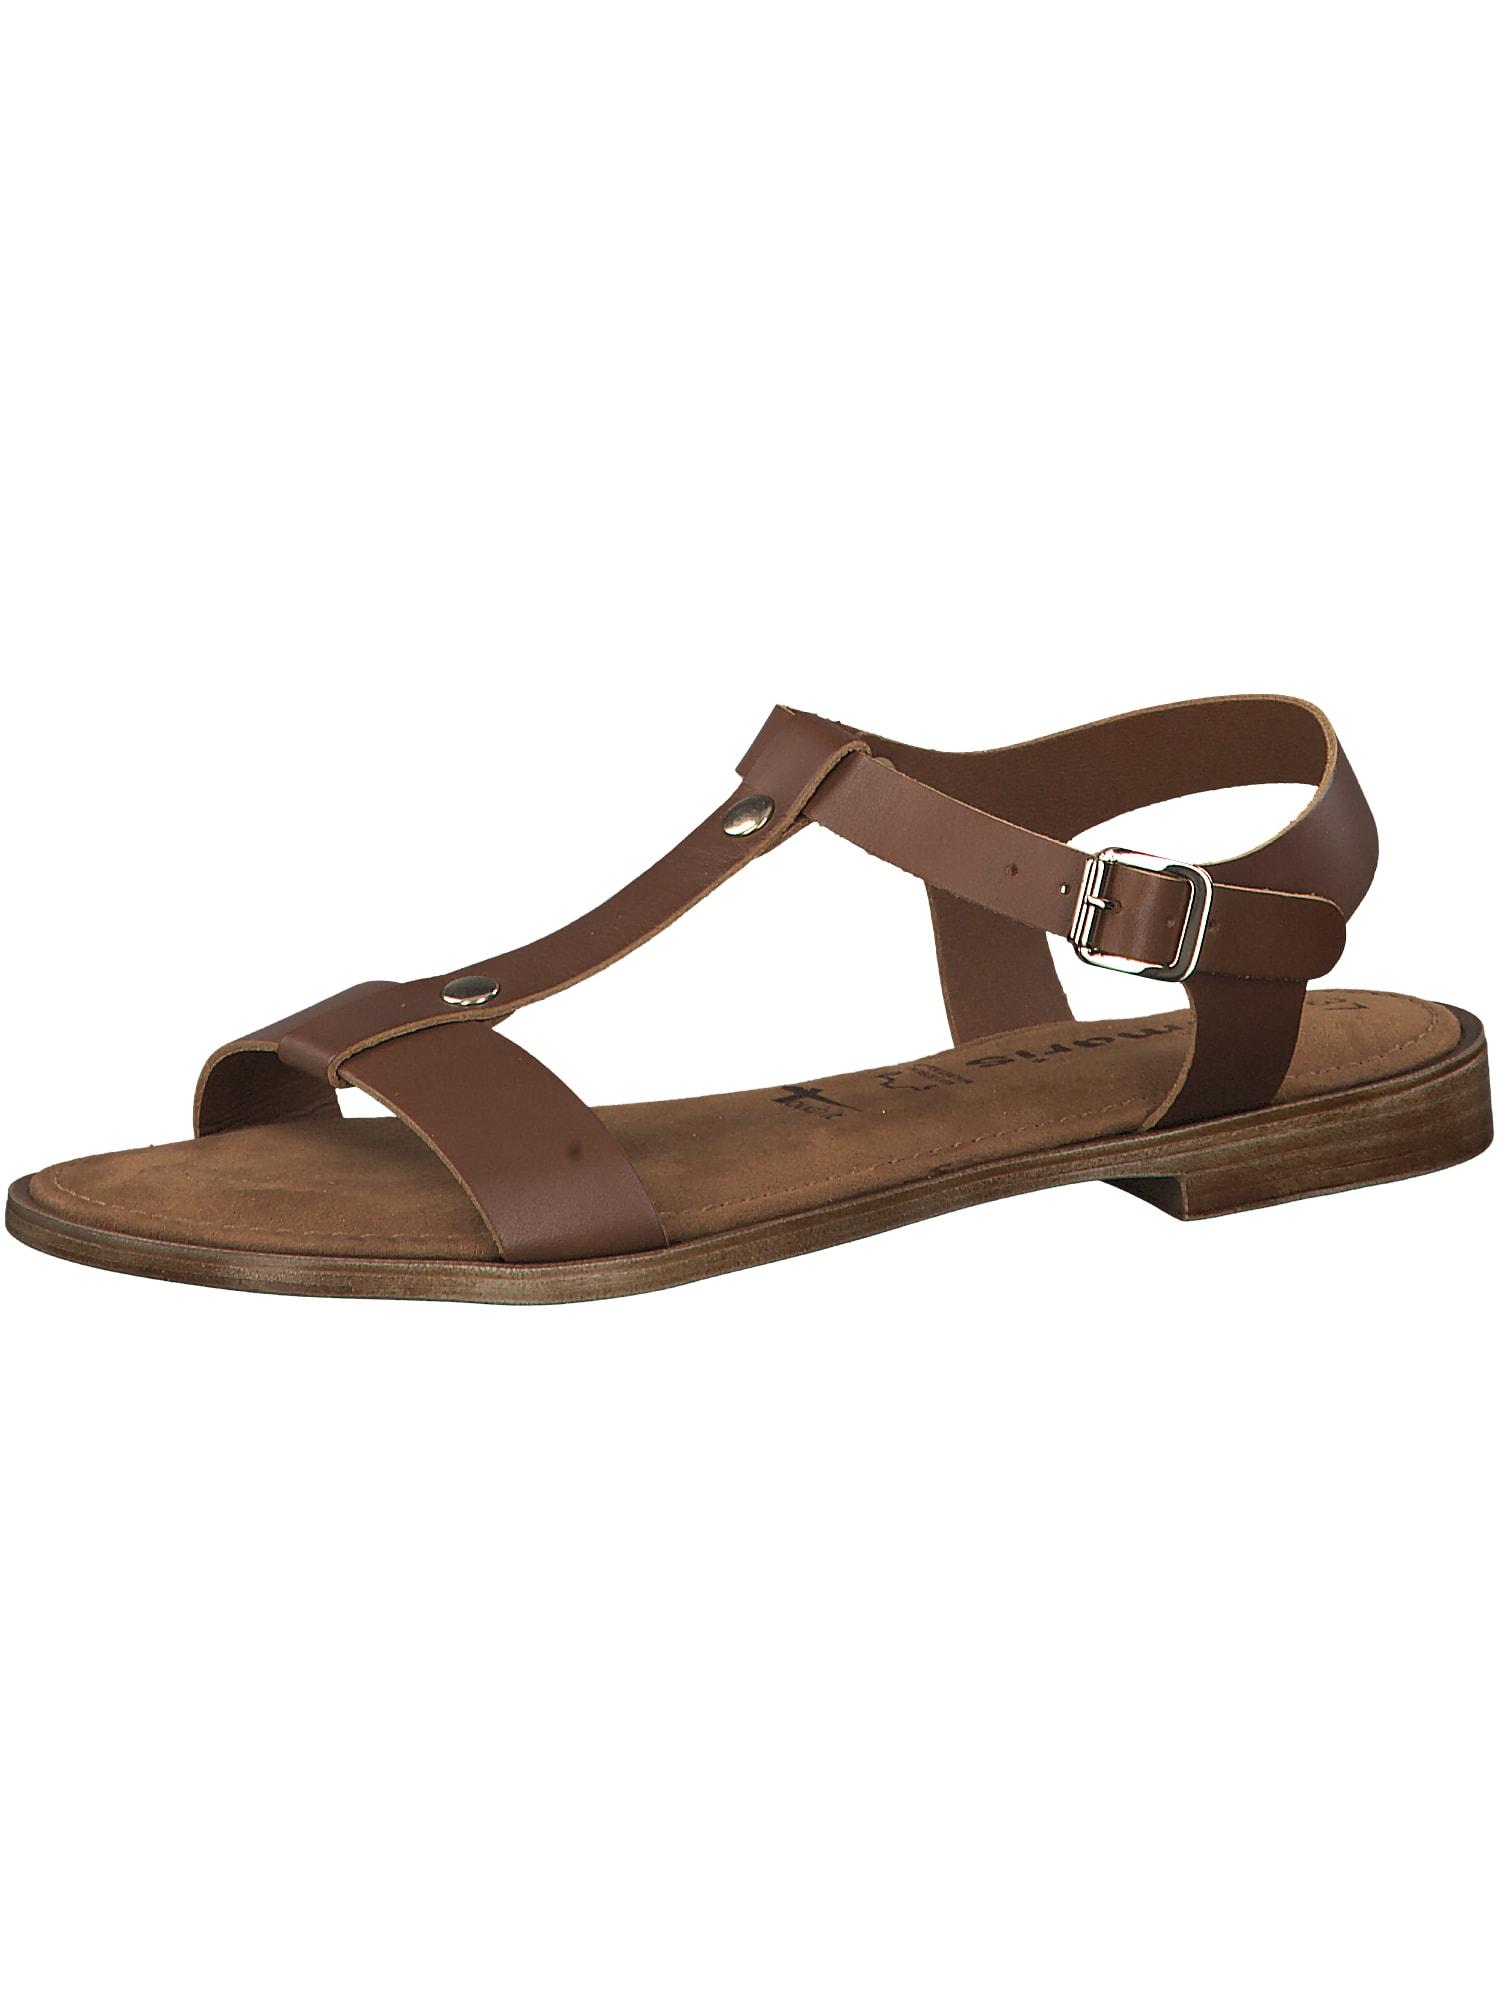 Sandale | Schuhe > Sandalen & Zehentrenner | tamaris